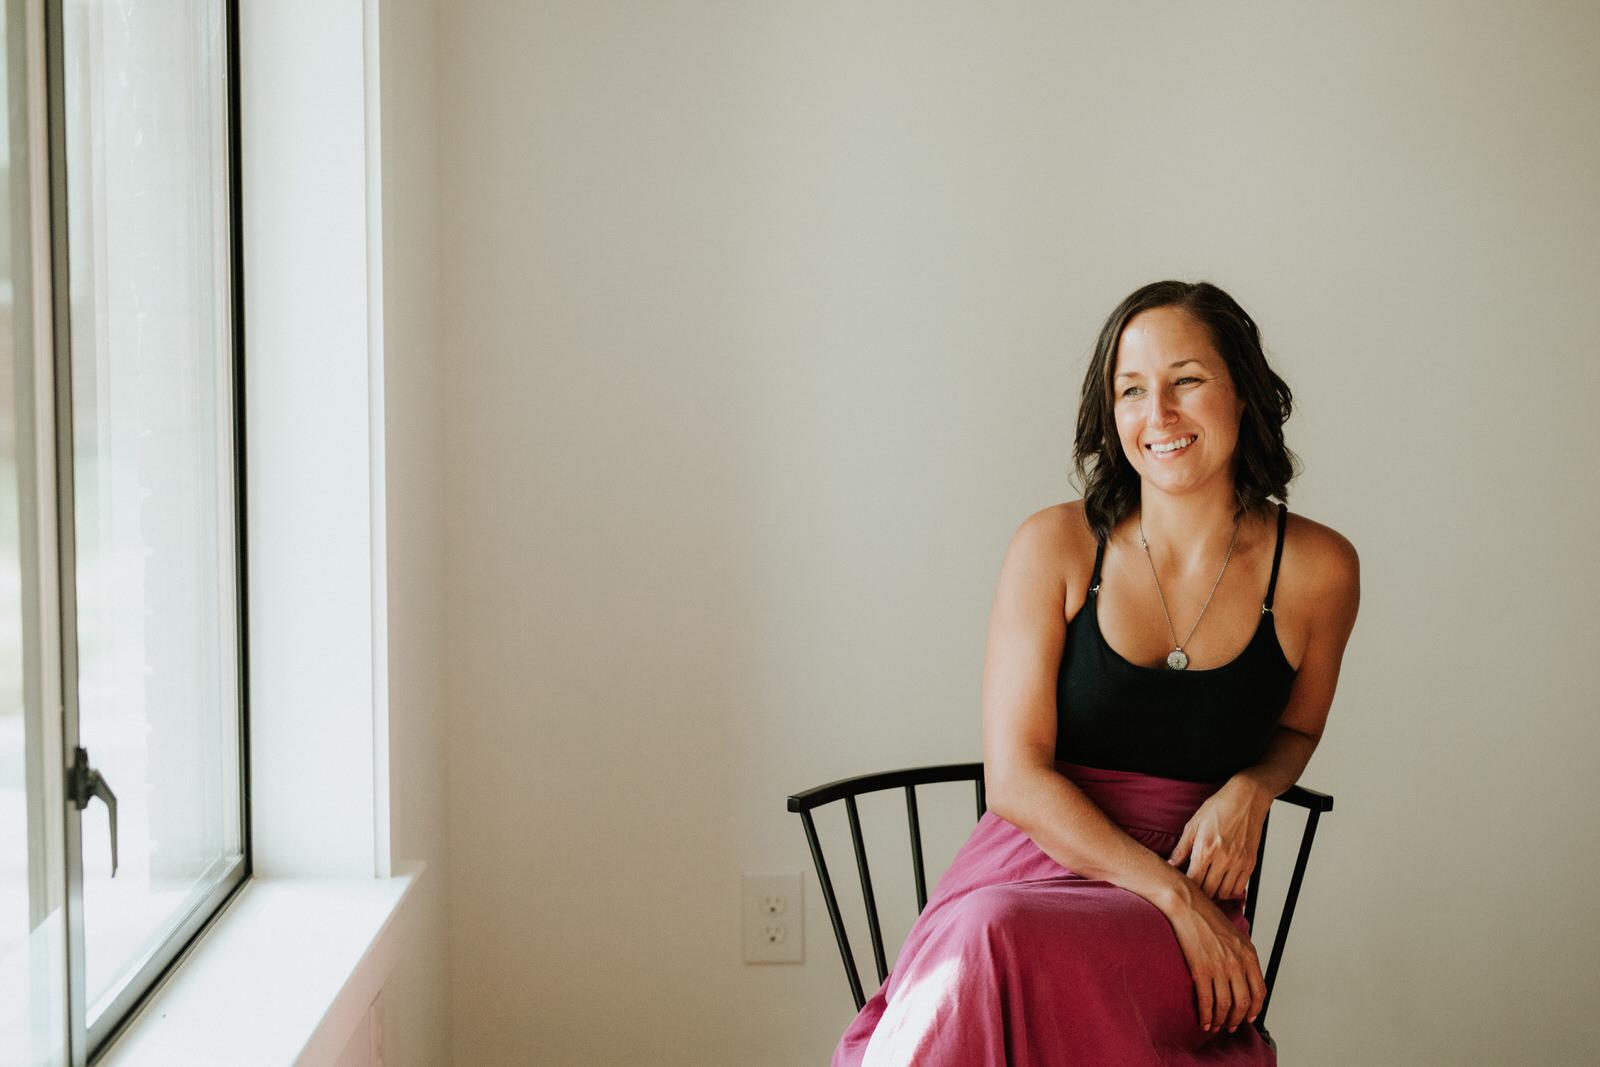 Austin small business photo shoot with Kassy Maloney